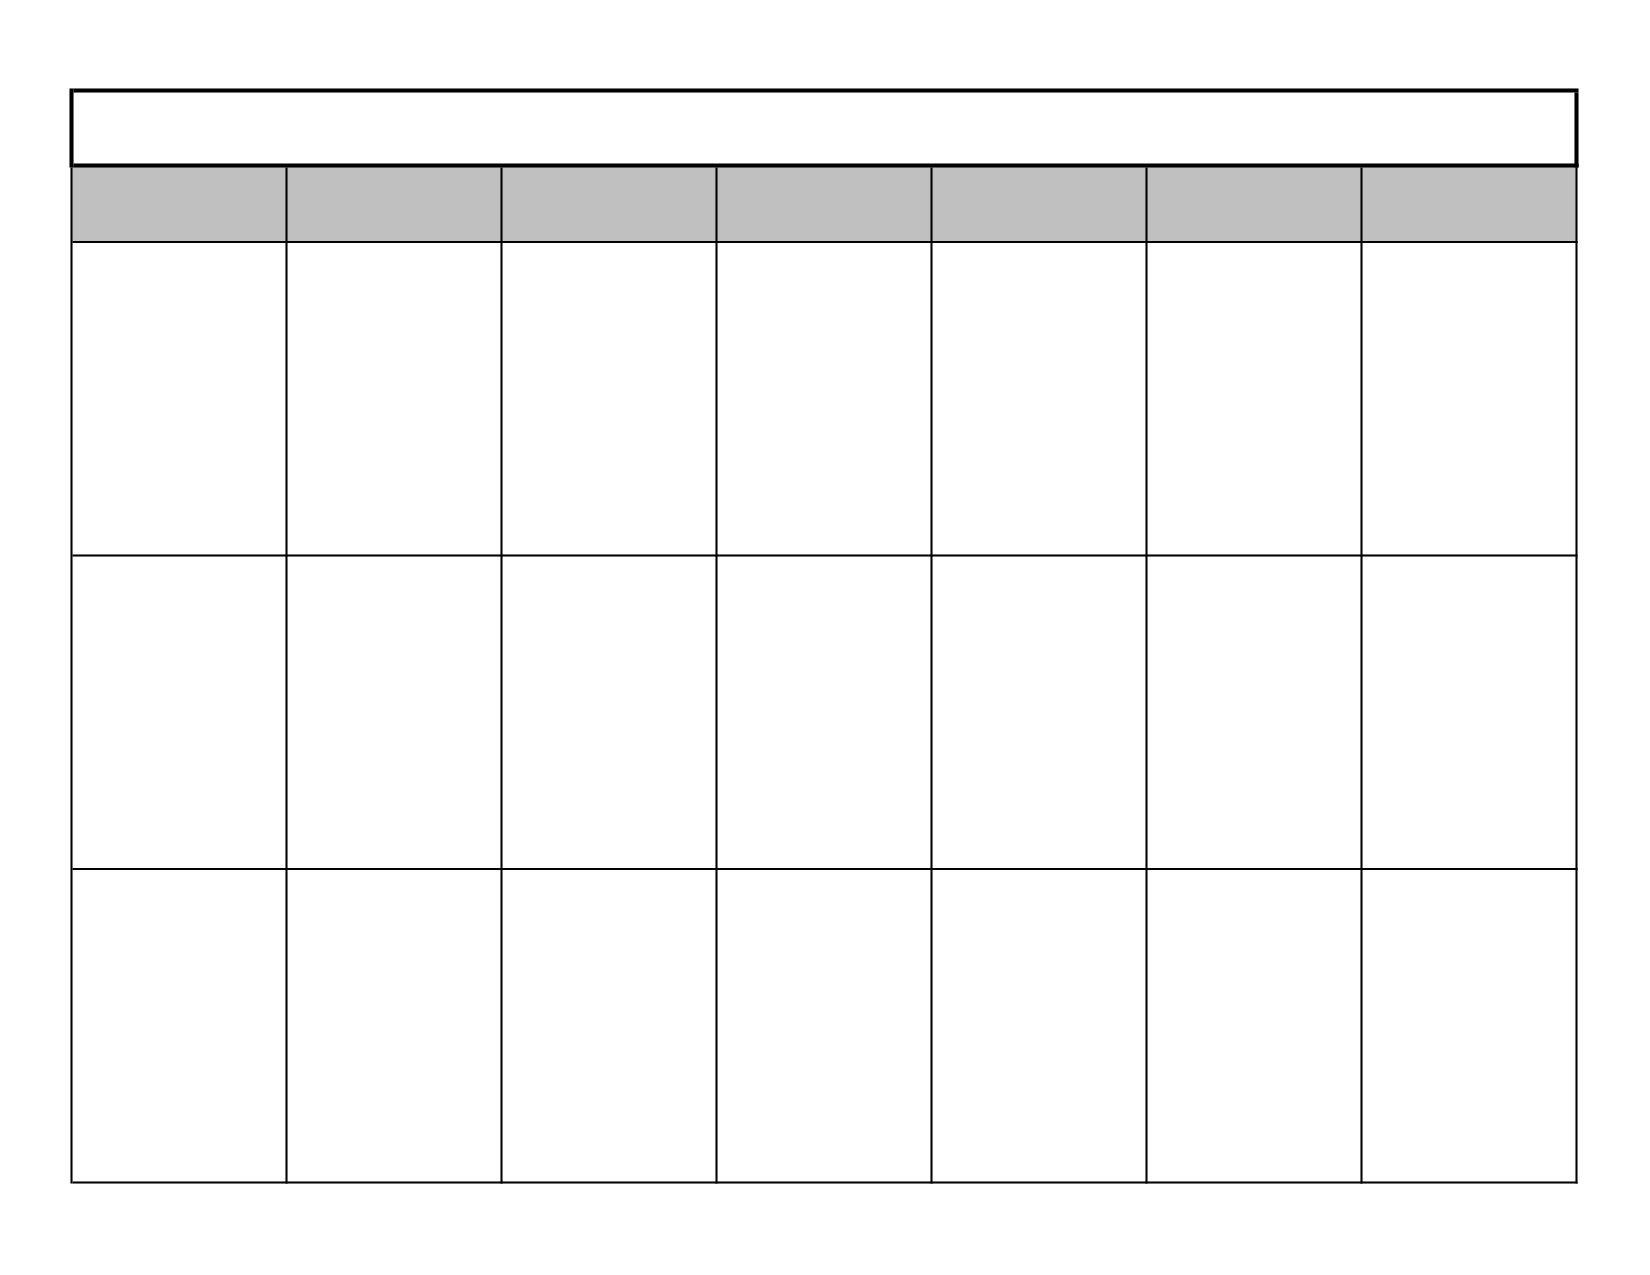 Blank 2 Week Calendar | 2020Calendartemplates Blank Two Week Calendar